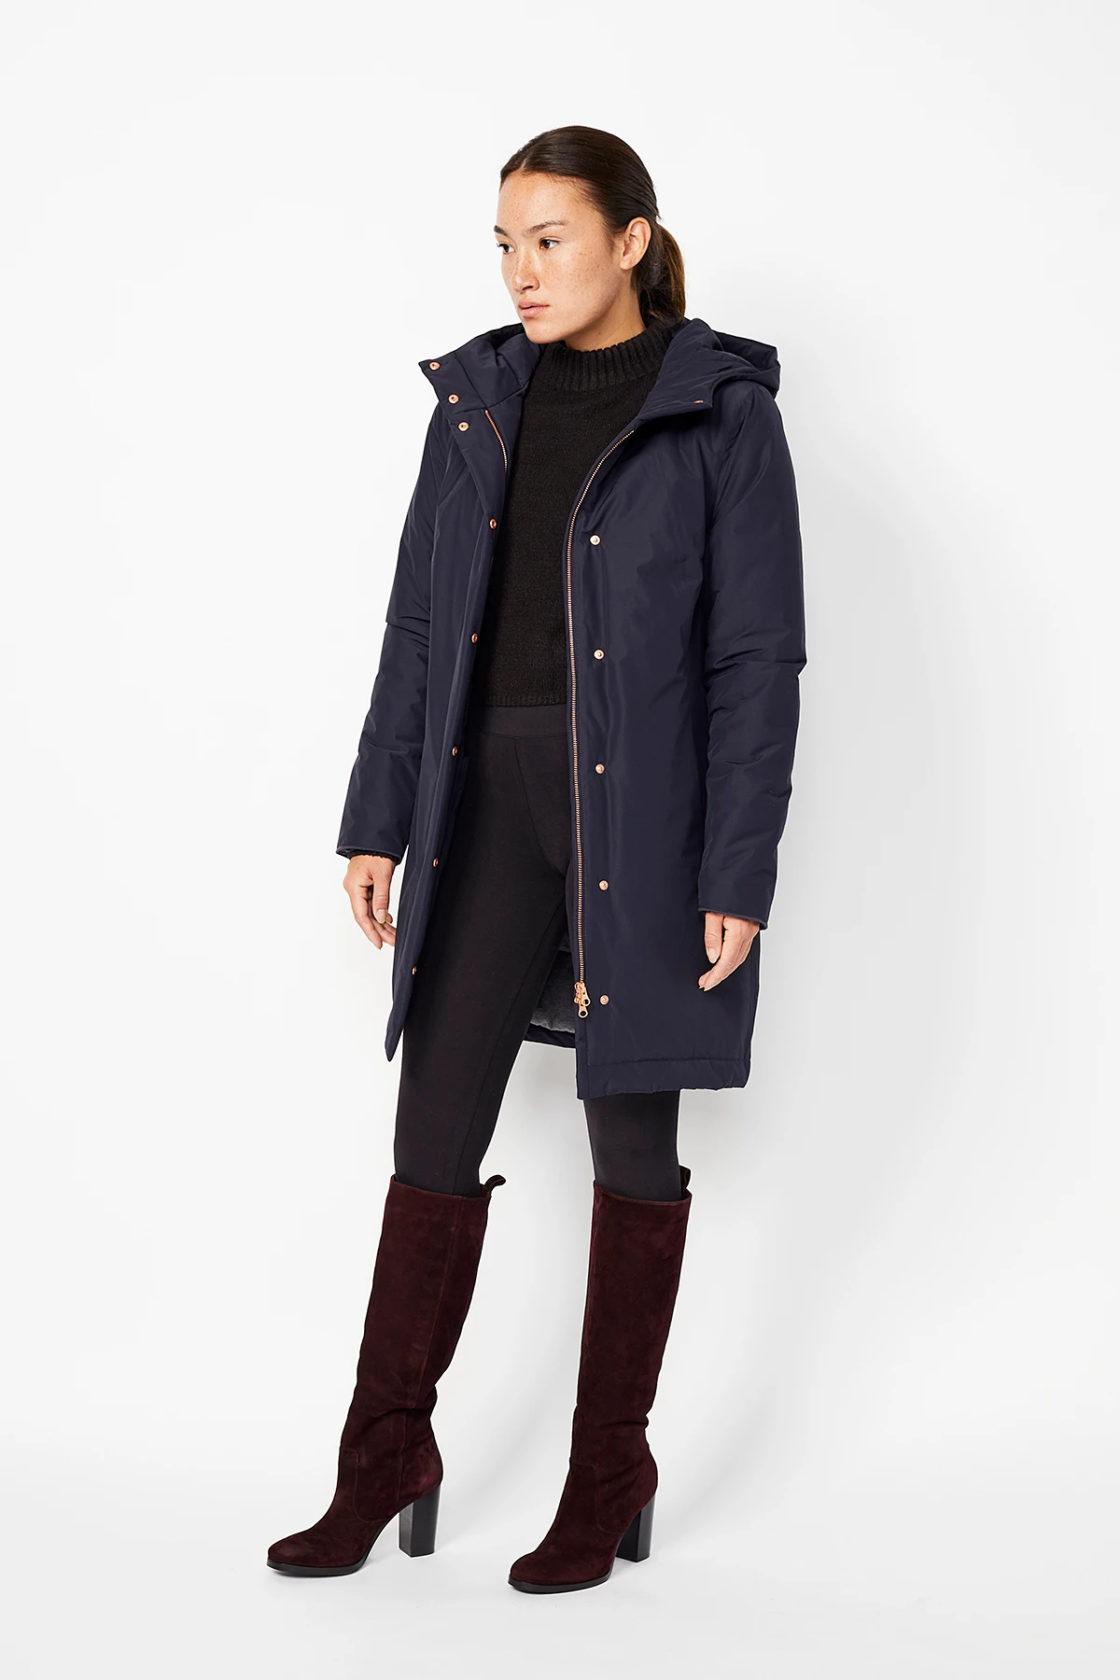 Roberta Organic Fashion Langerchen Coat Ariza Navy